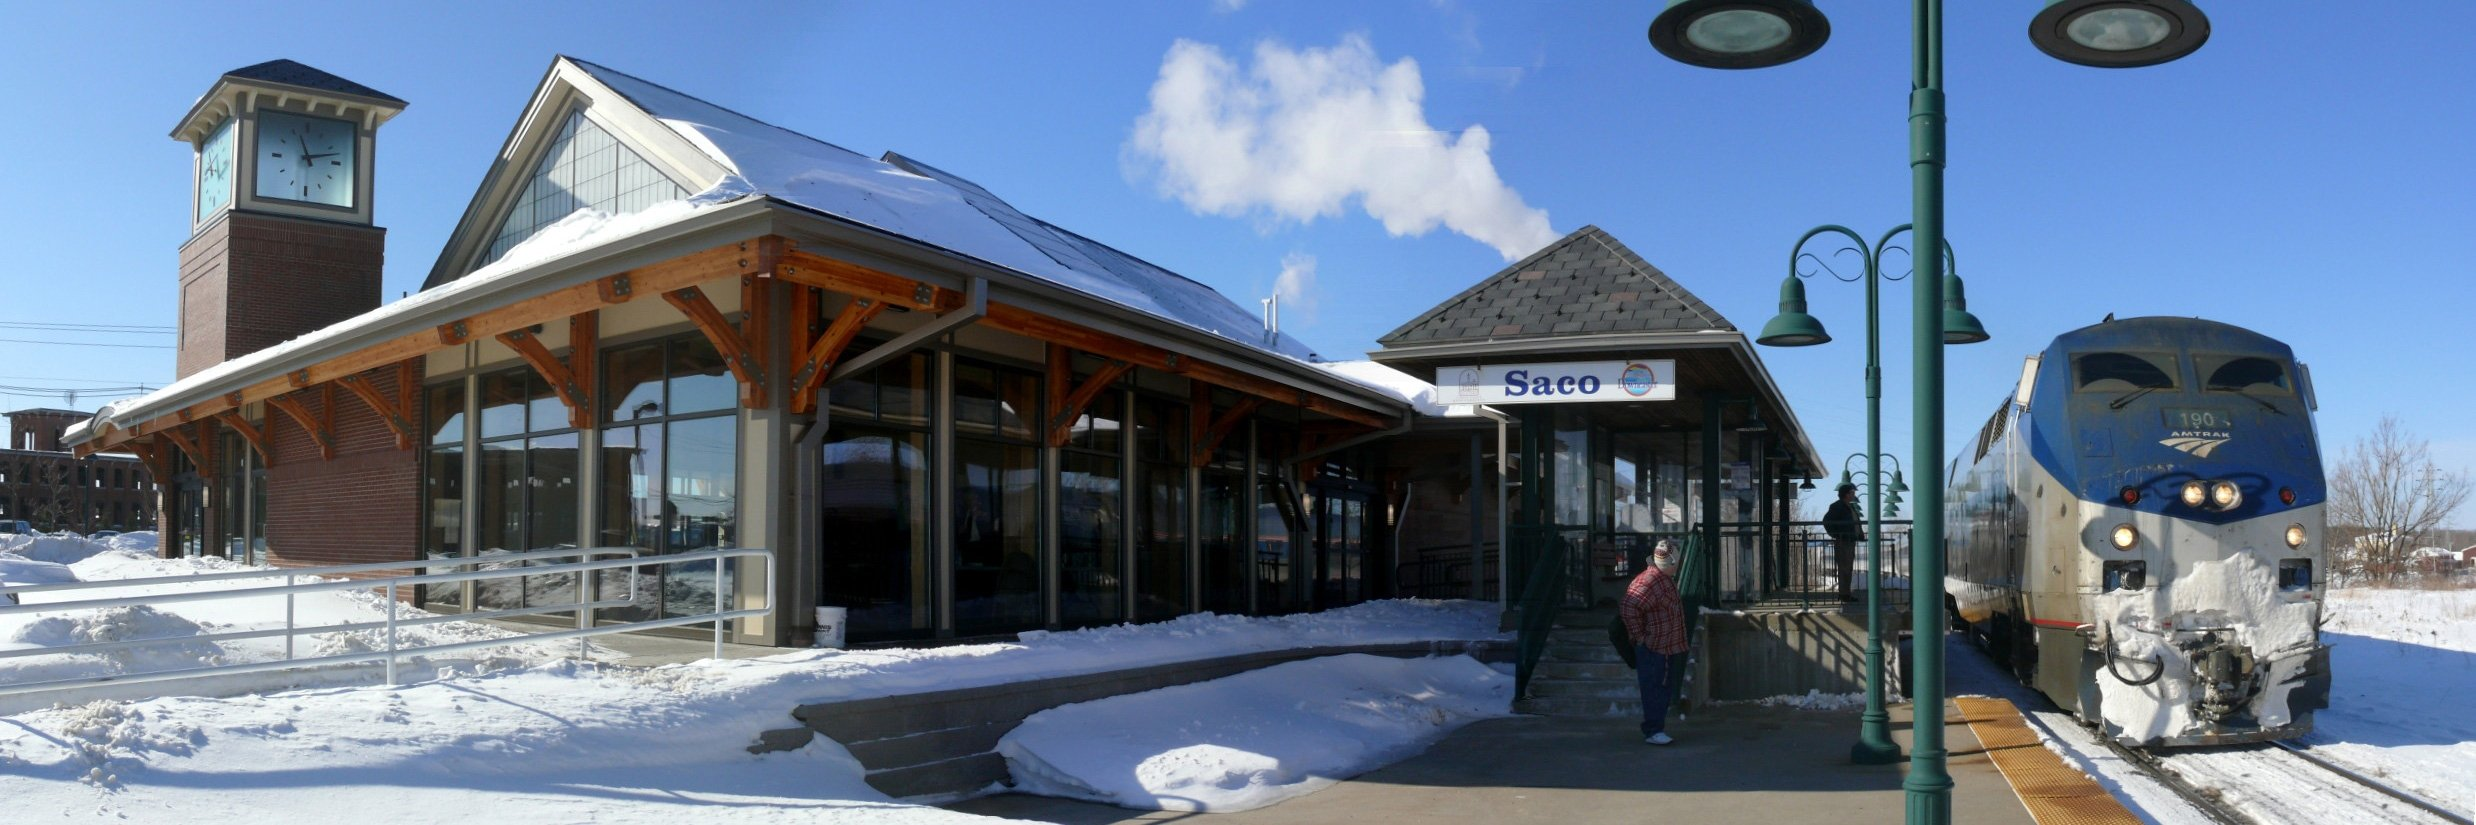 Saco Station, Saco Maine